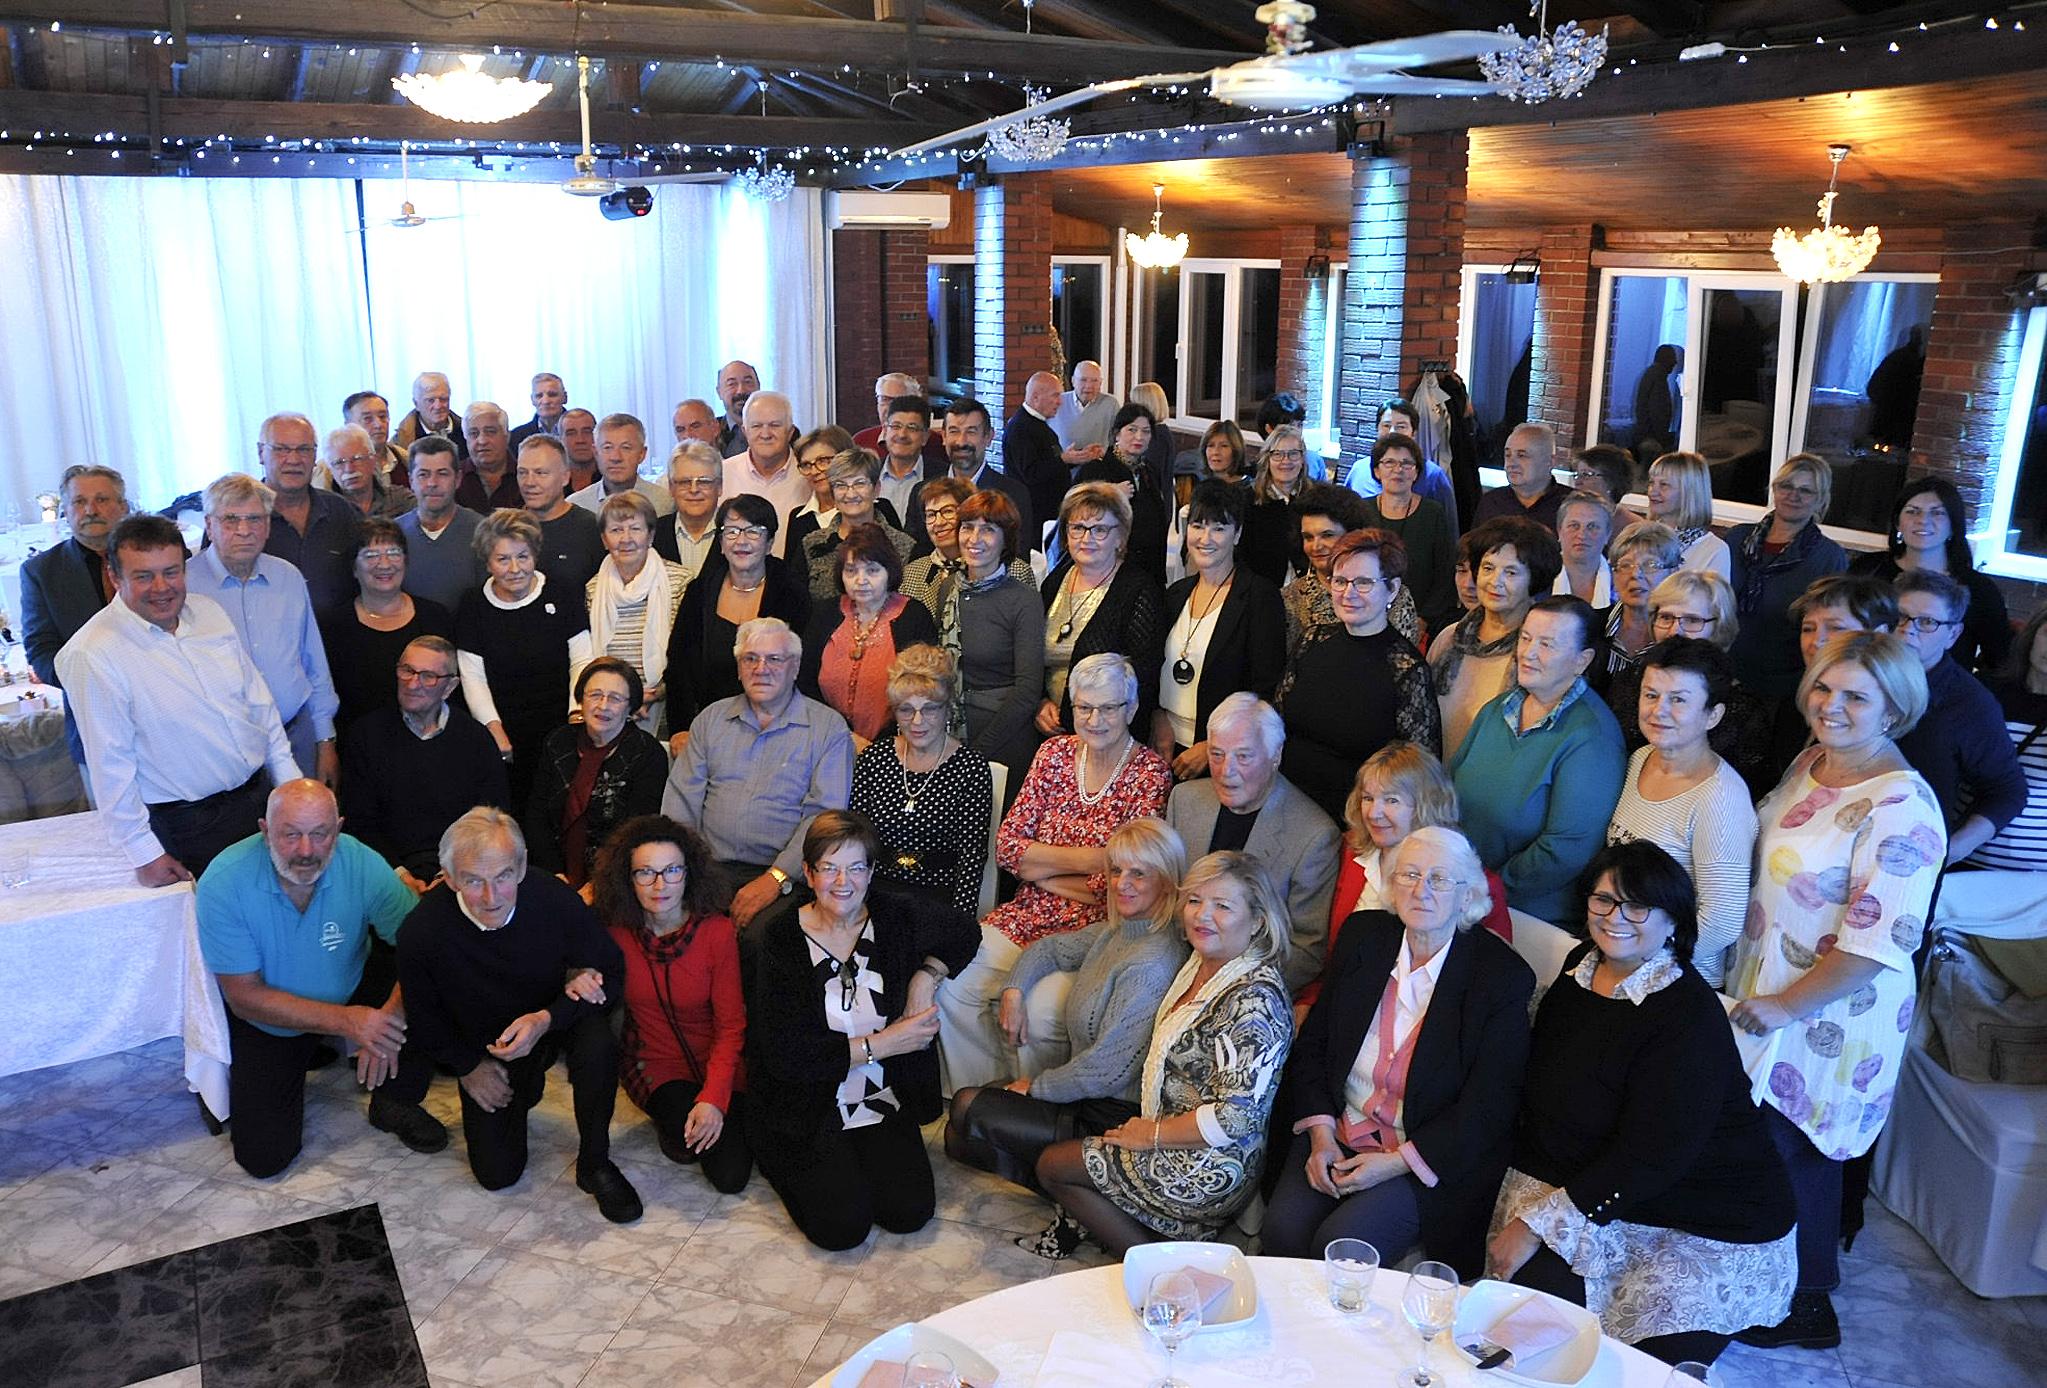 Više od stotinu bivših zaposlenika Kvarner Expressa dobro se zabavilo / Snimio Sergej DRECHSLER